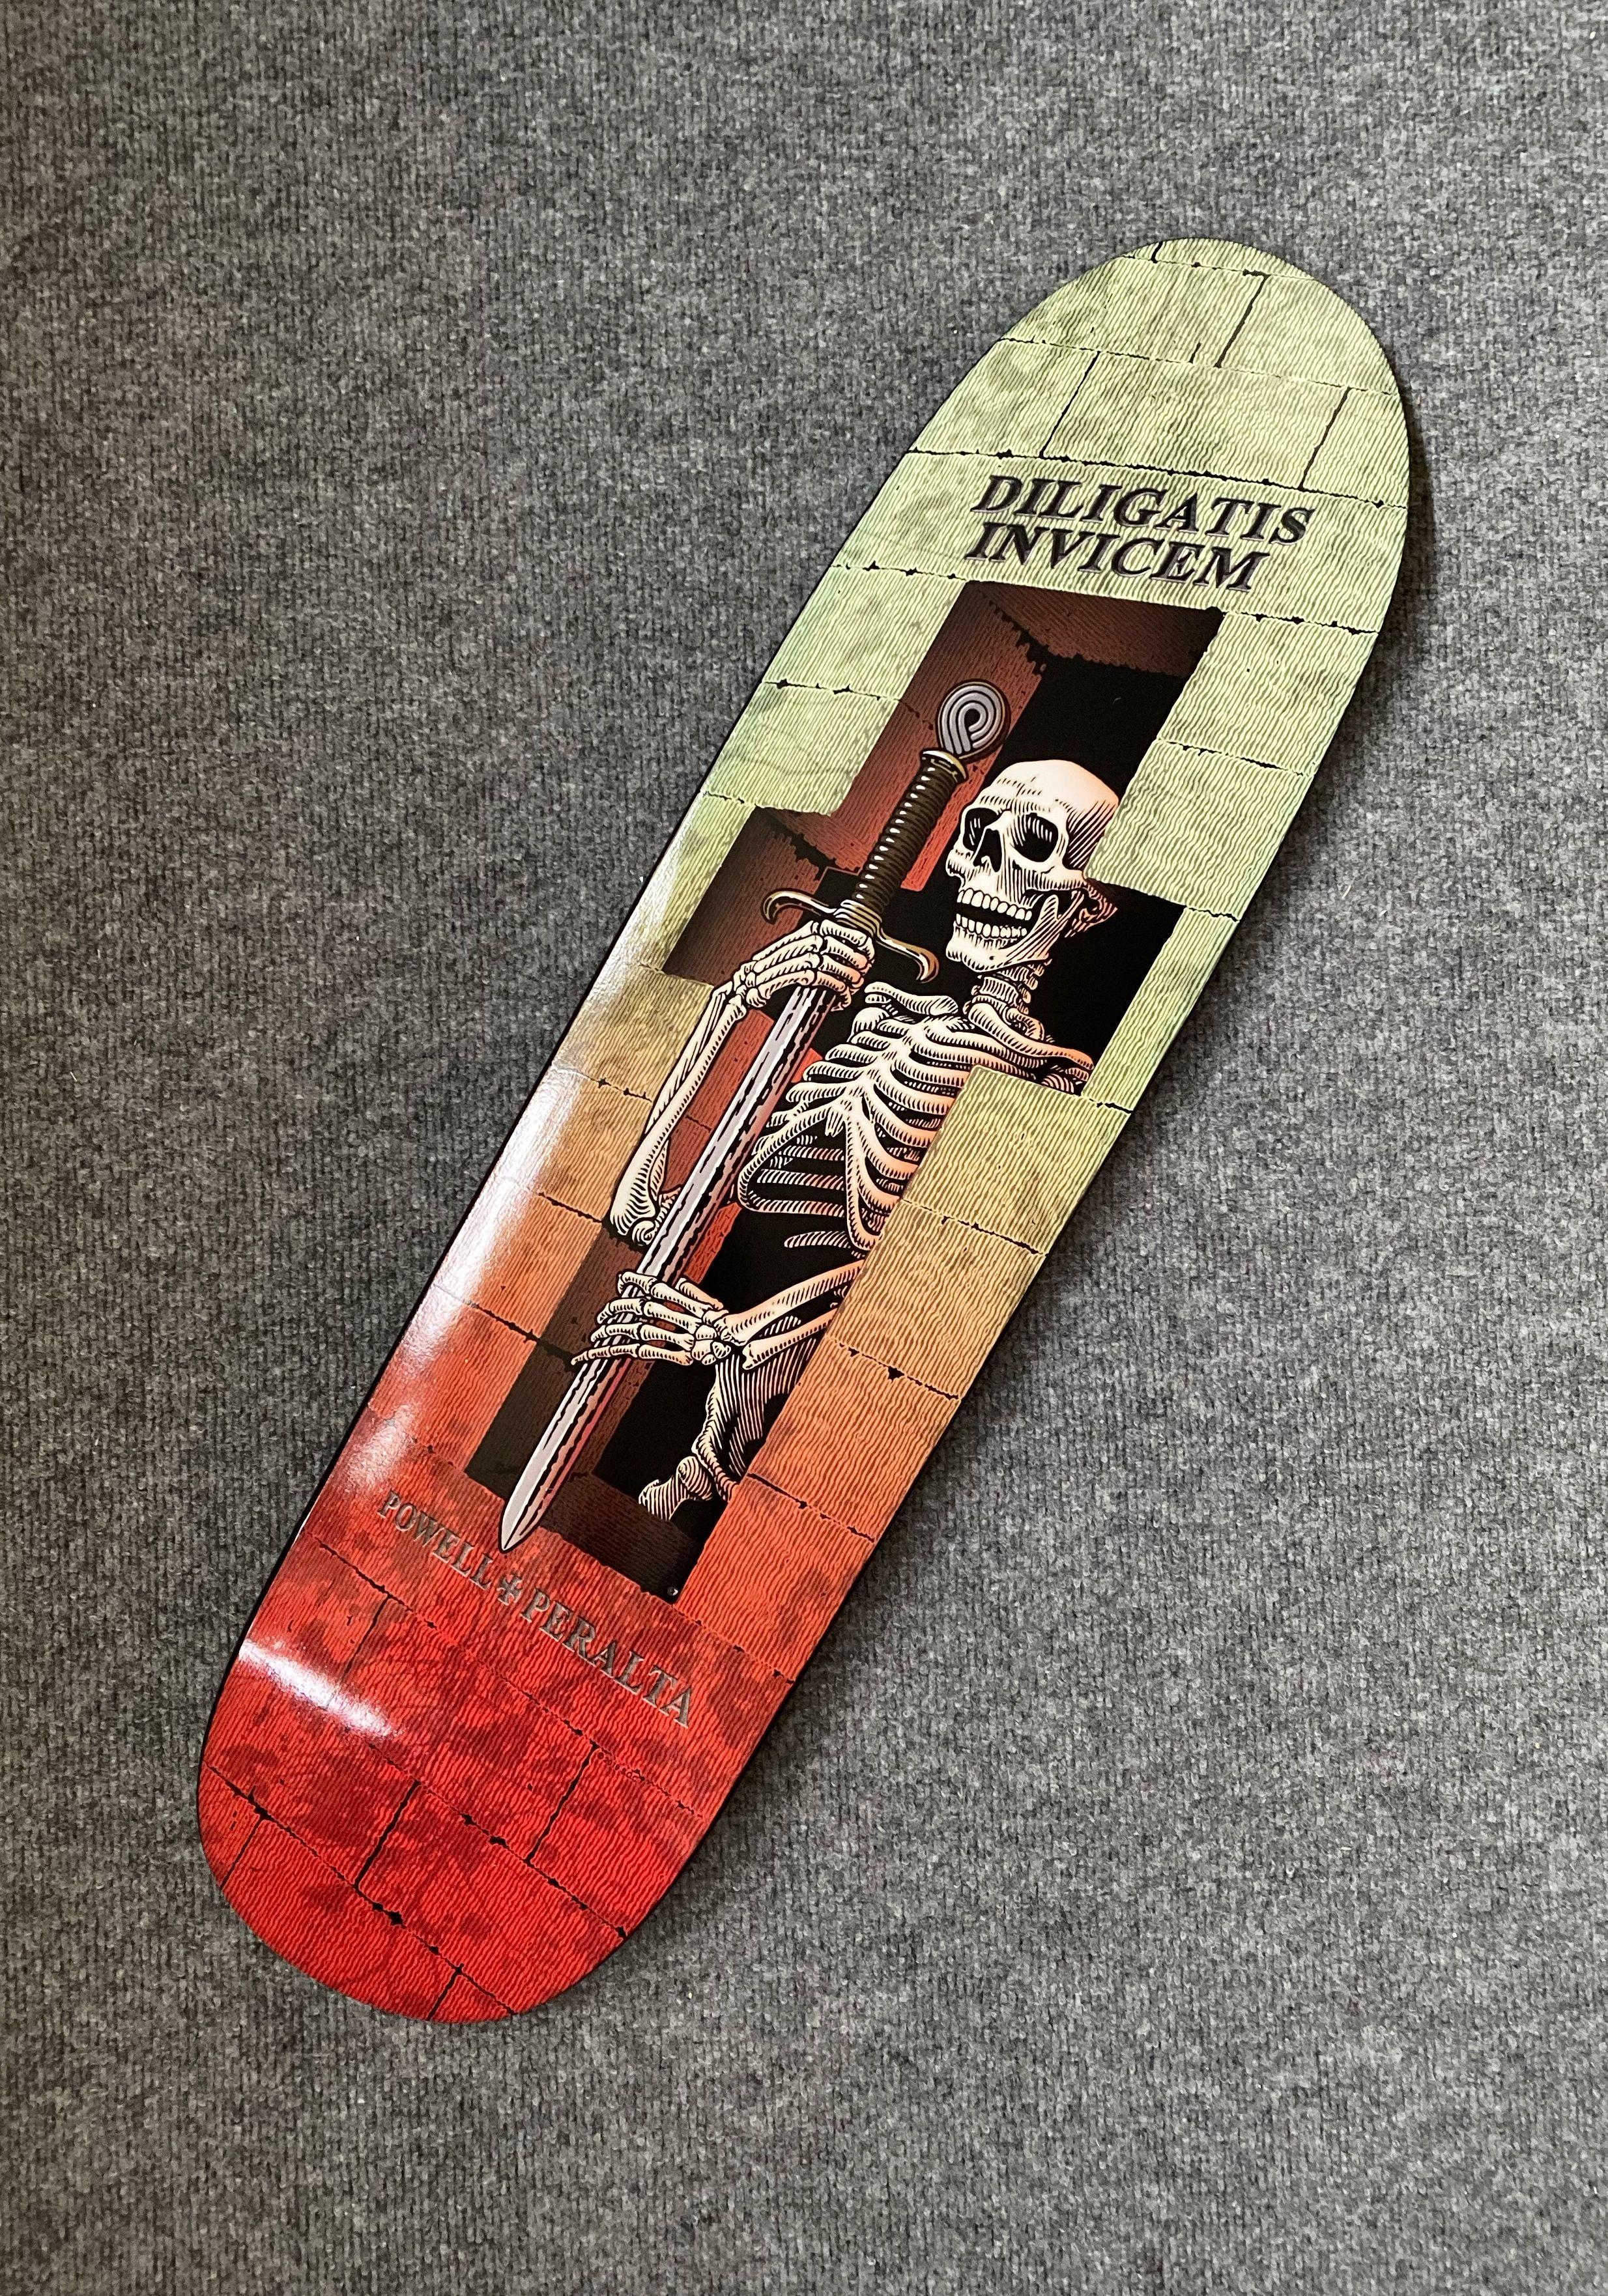 Powell Peralta Funshape Diligatis 3 Skateboard Deck Green Red 8 4 X 31 5 In 2020 Skateboard Skateboard Decks Skateboard Deck Art